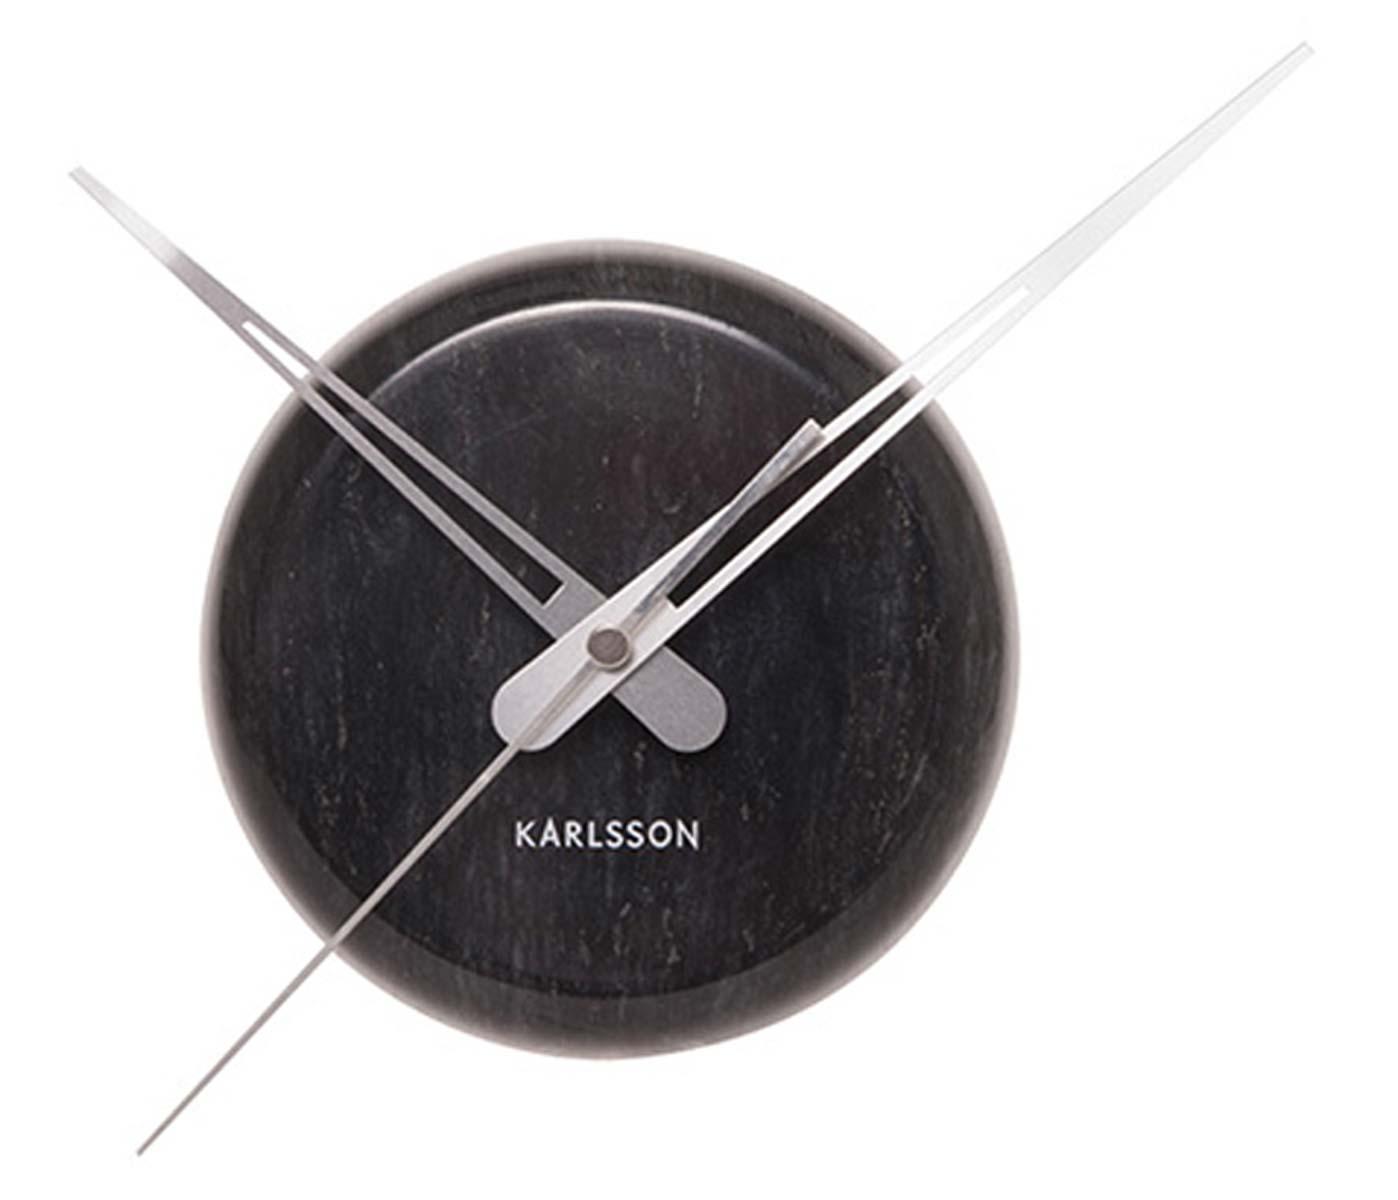 karlsson ka5535bk wanduhr uhren neu ebay. Black Bedroom Furniture Sets. Home Design Ideas